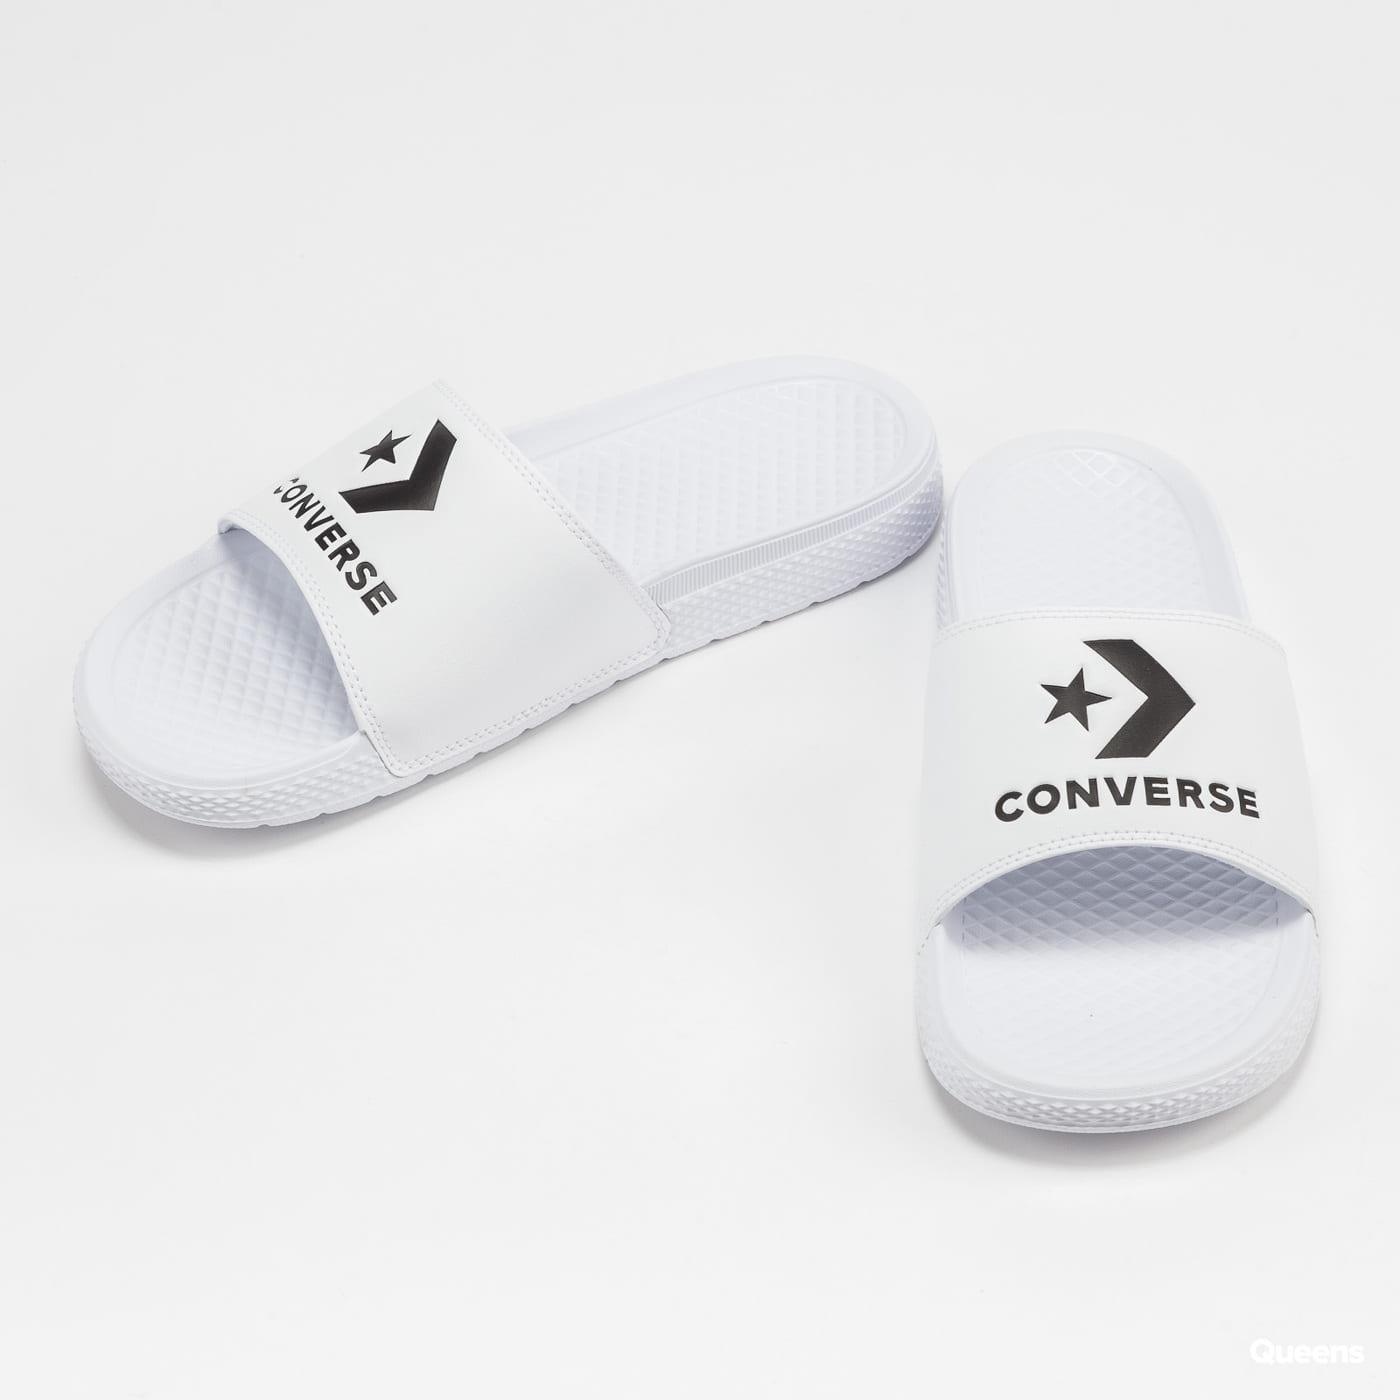 Converse Chuck Taylor All Star Slide white / black / white